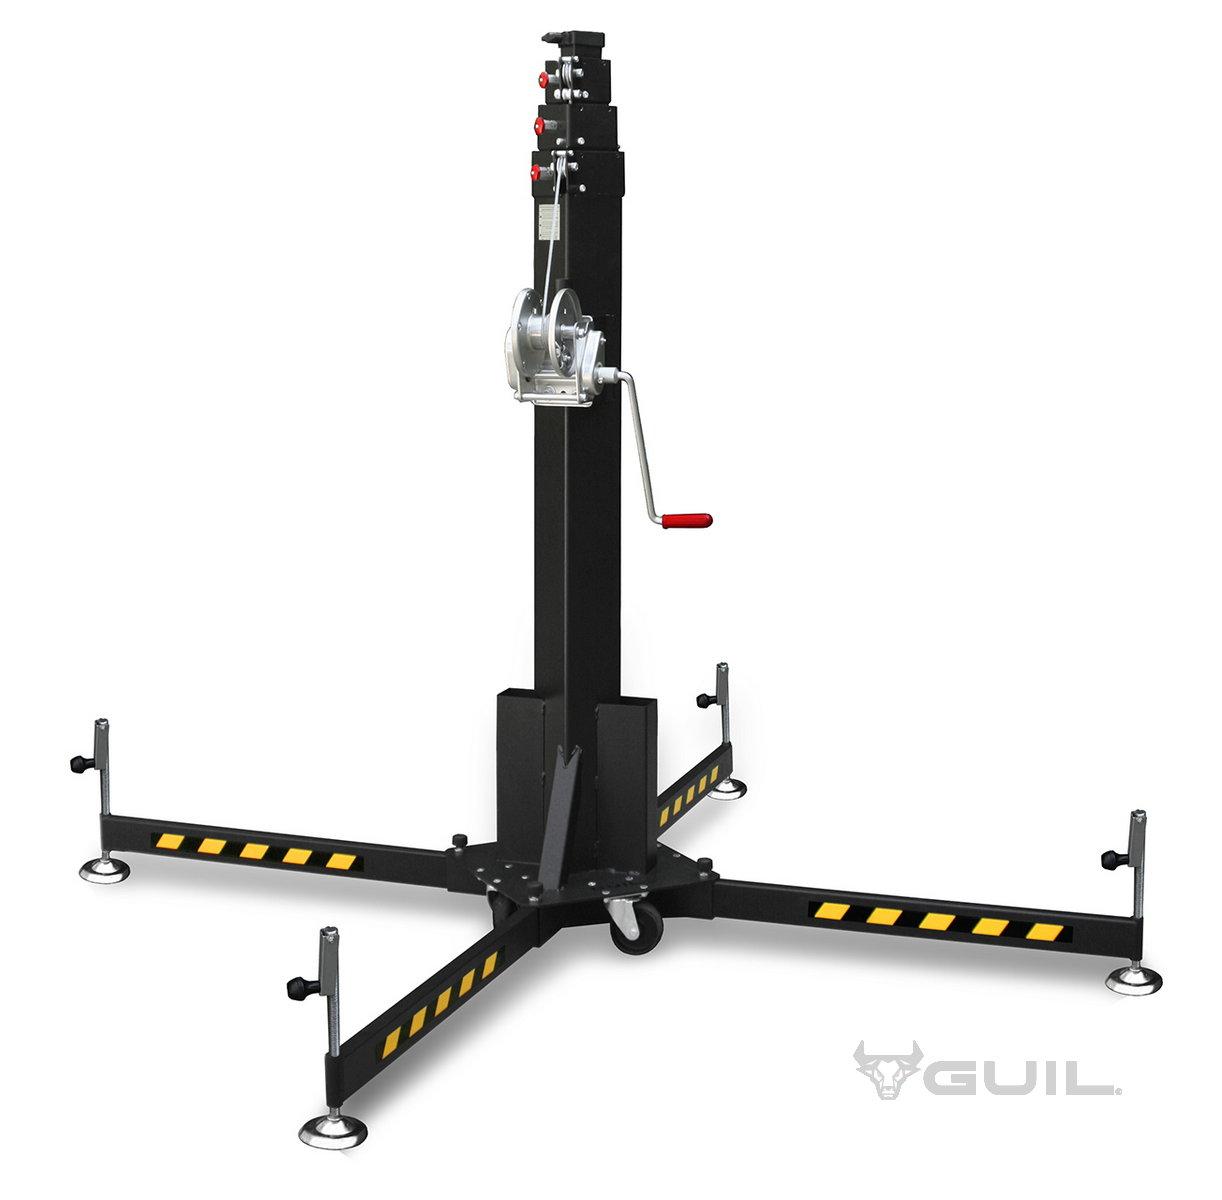 Materiaallift 1,8-5,2 m 250 kg (dutch) (1)